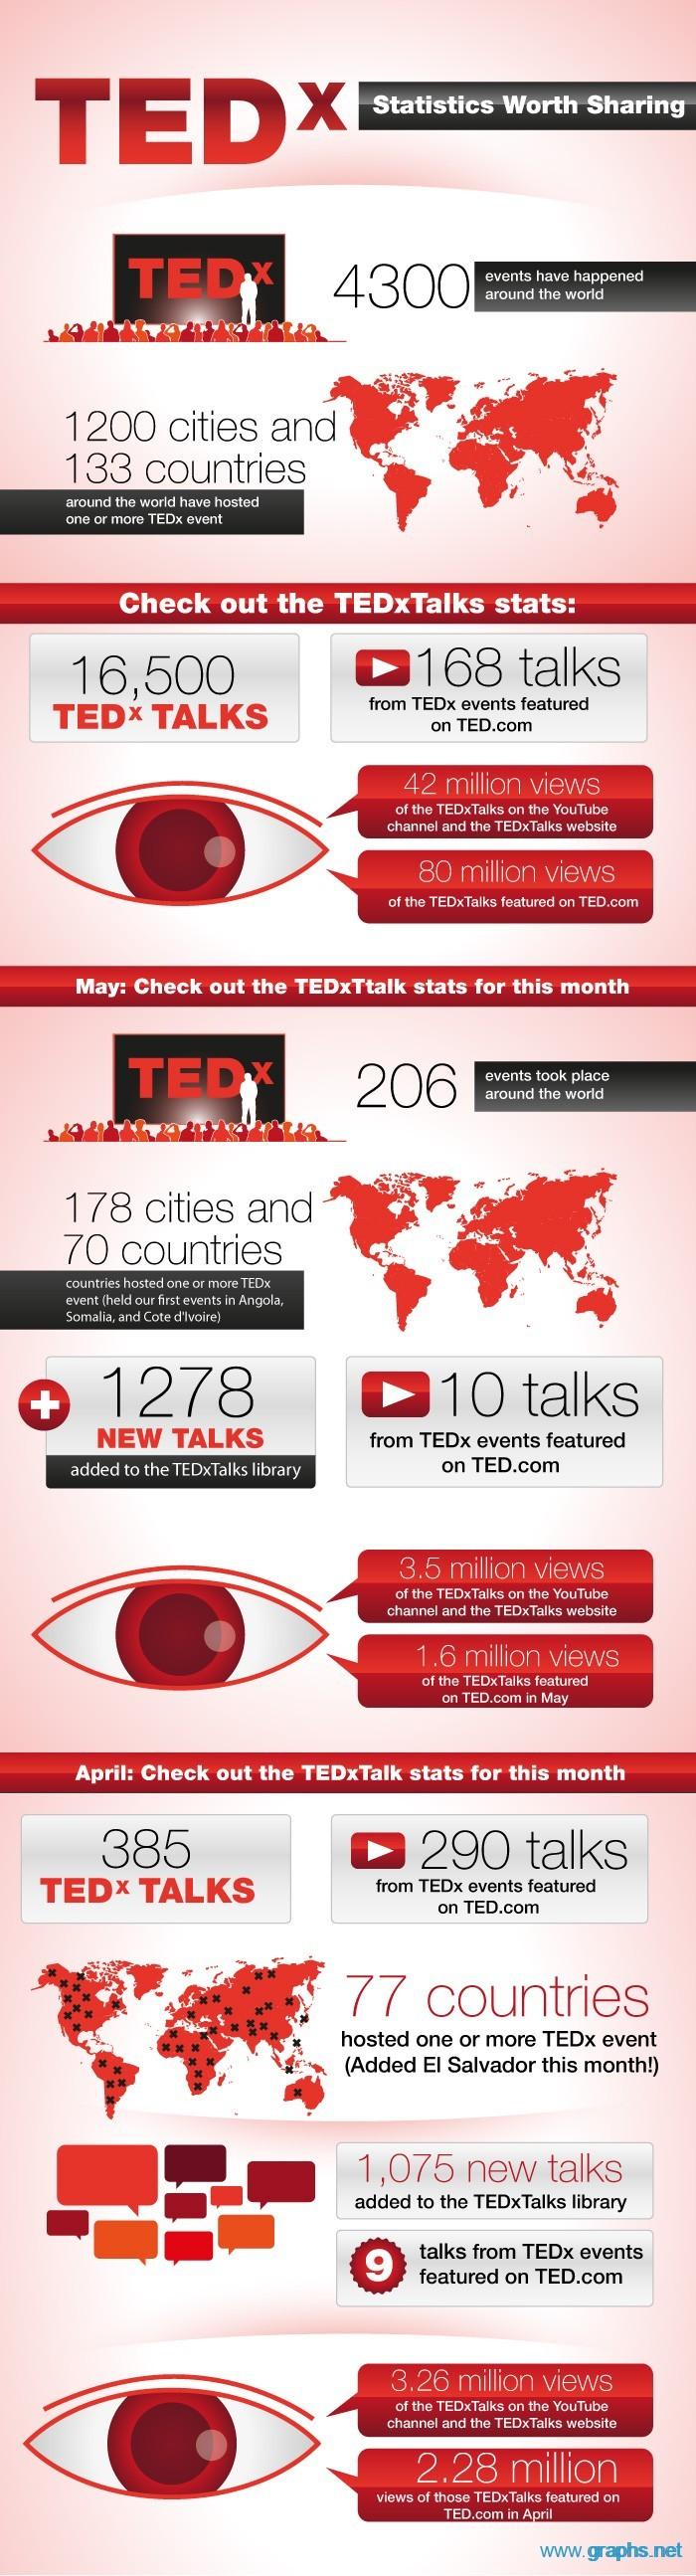 TEDx Sharing Statistics